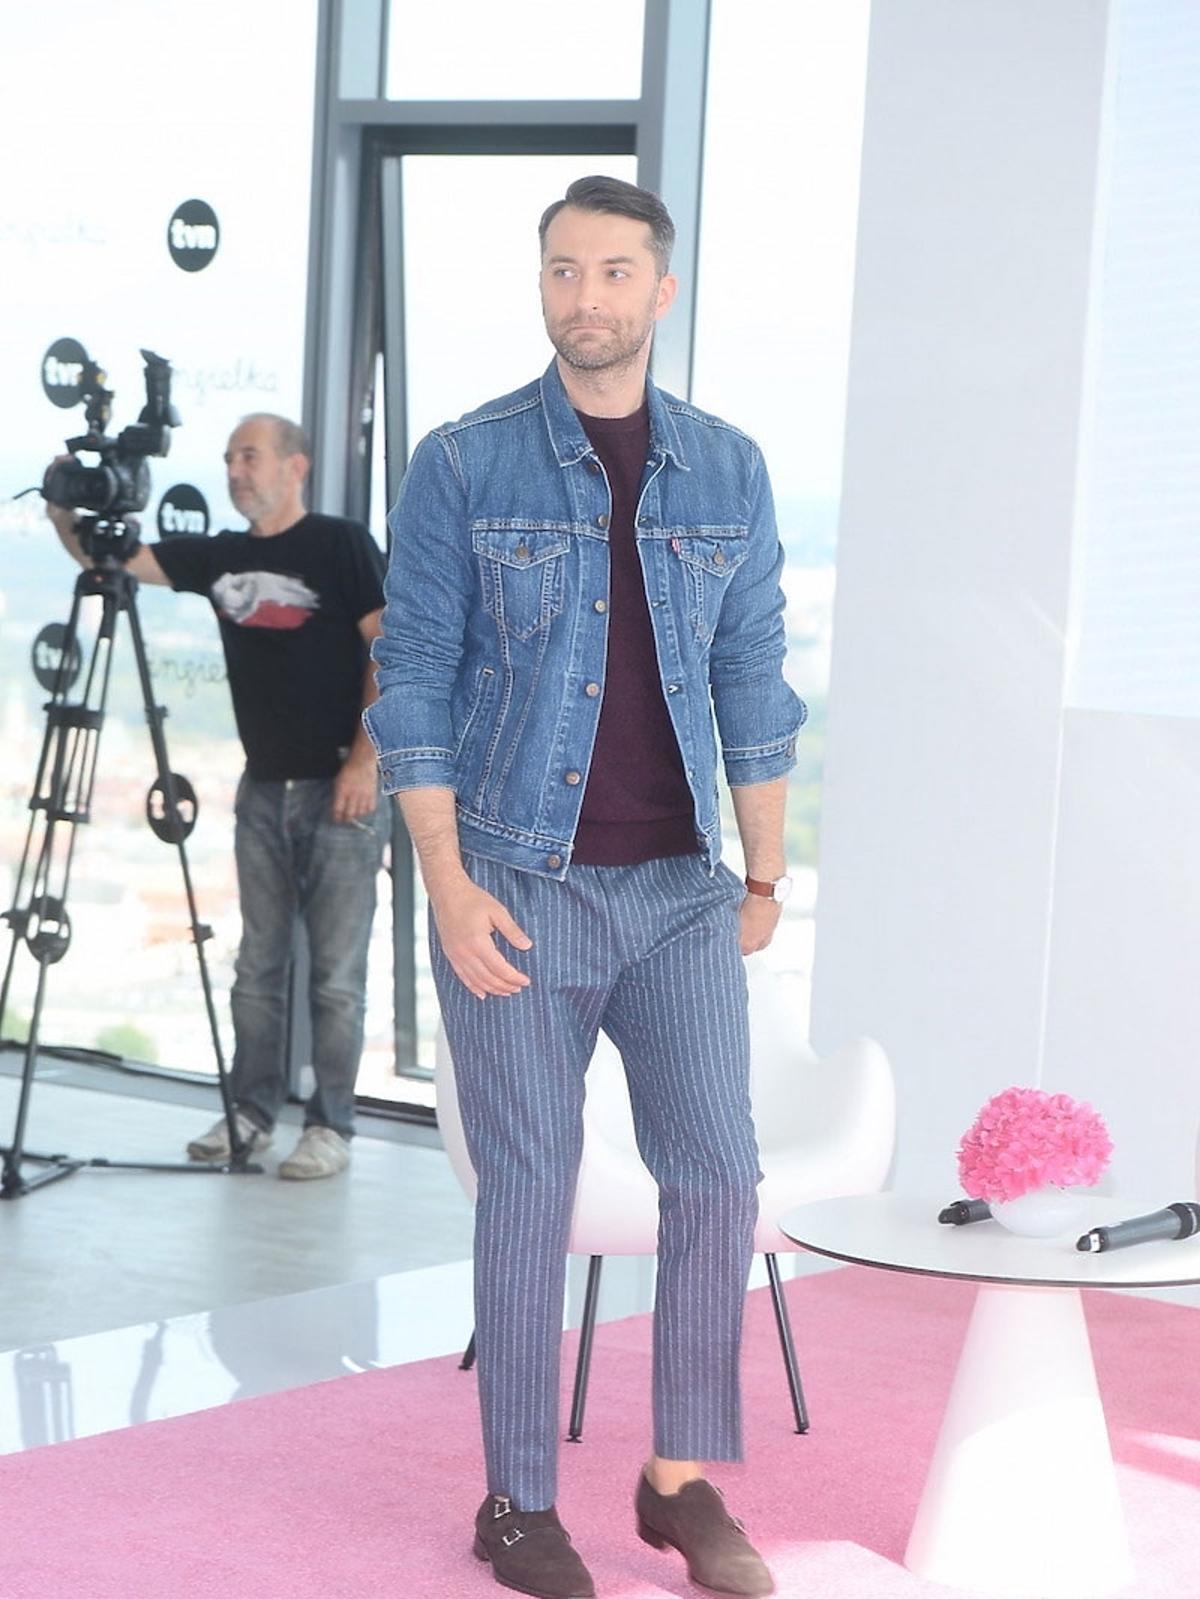 Filip Bobek w fioletowej koszulce